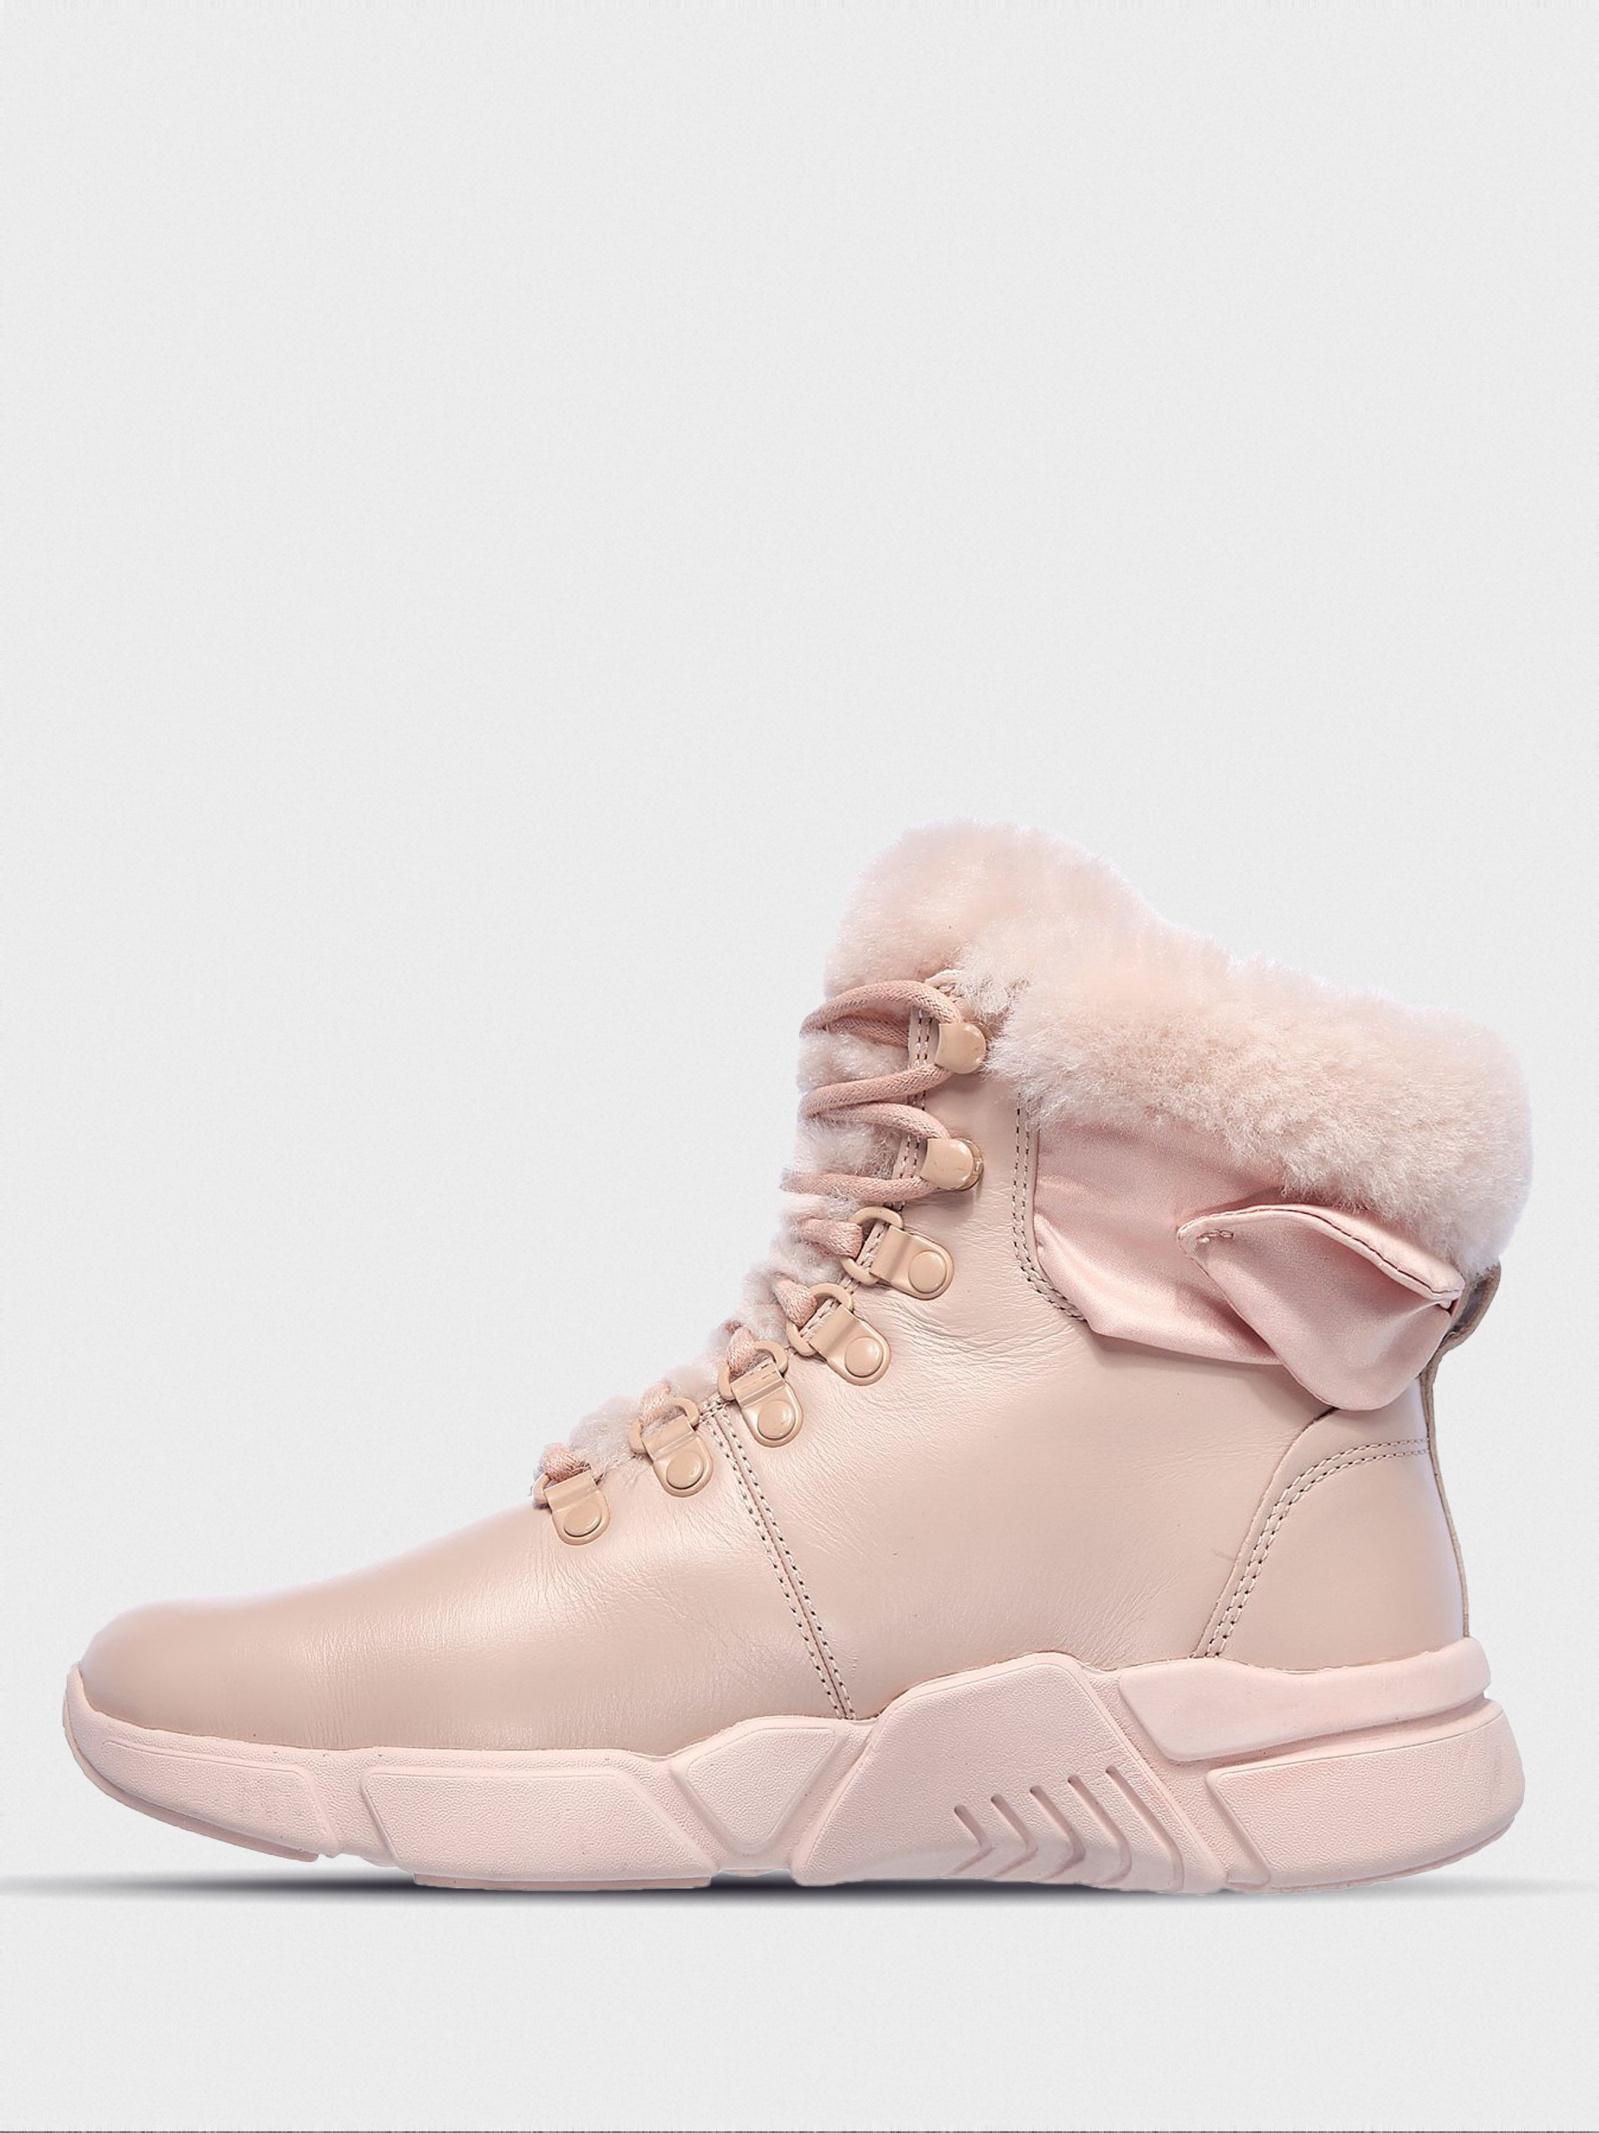 Сапоги женские Skechers Mark Nason KW5850 размеры обуви, 2017